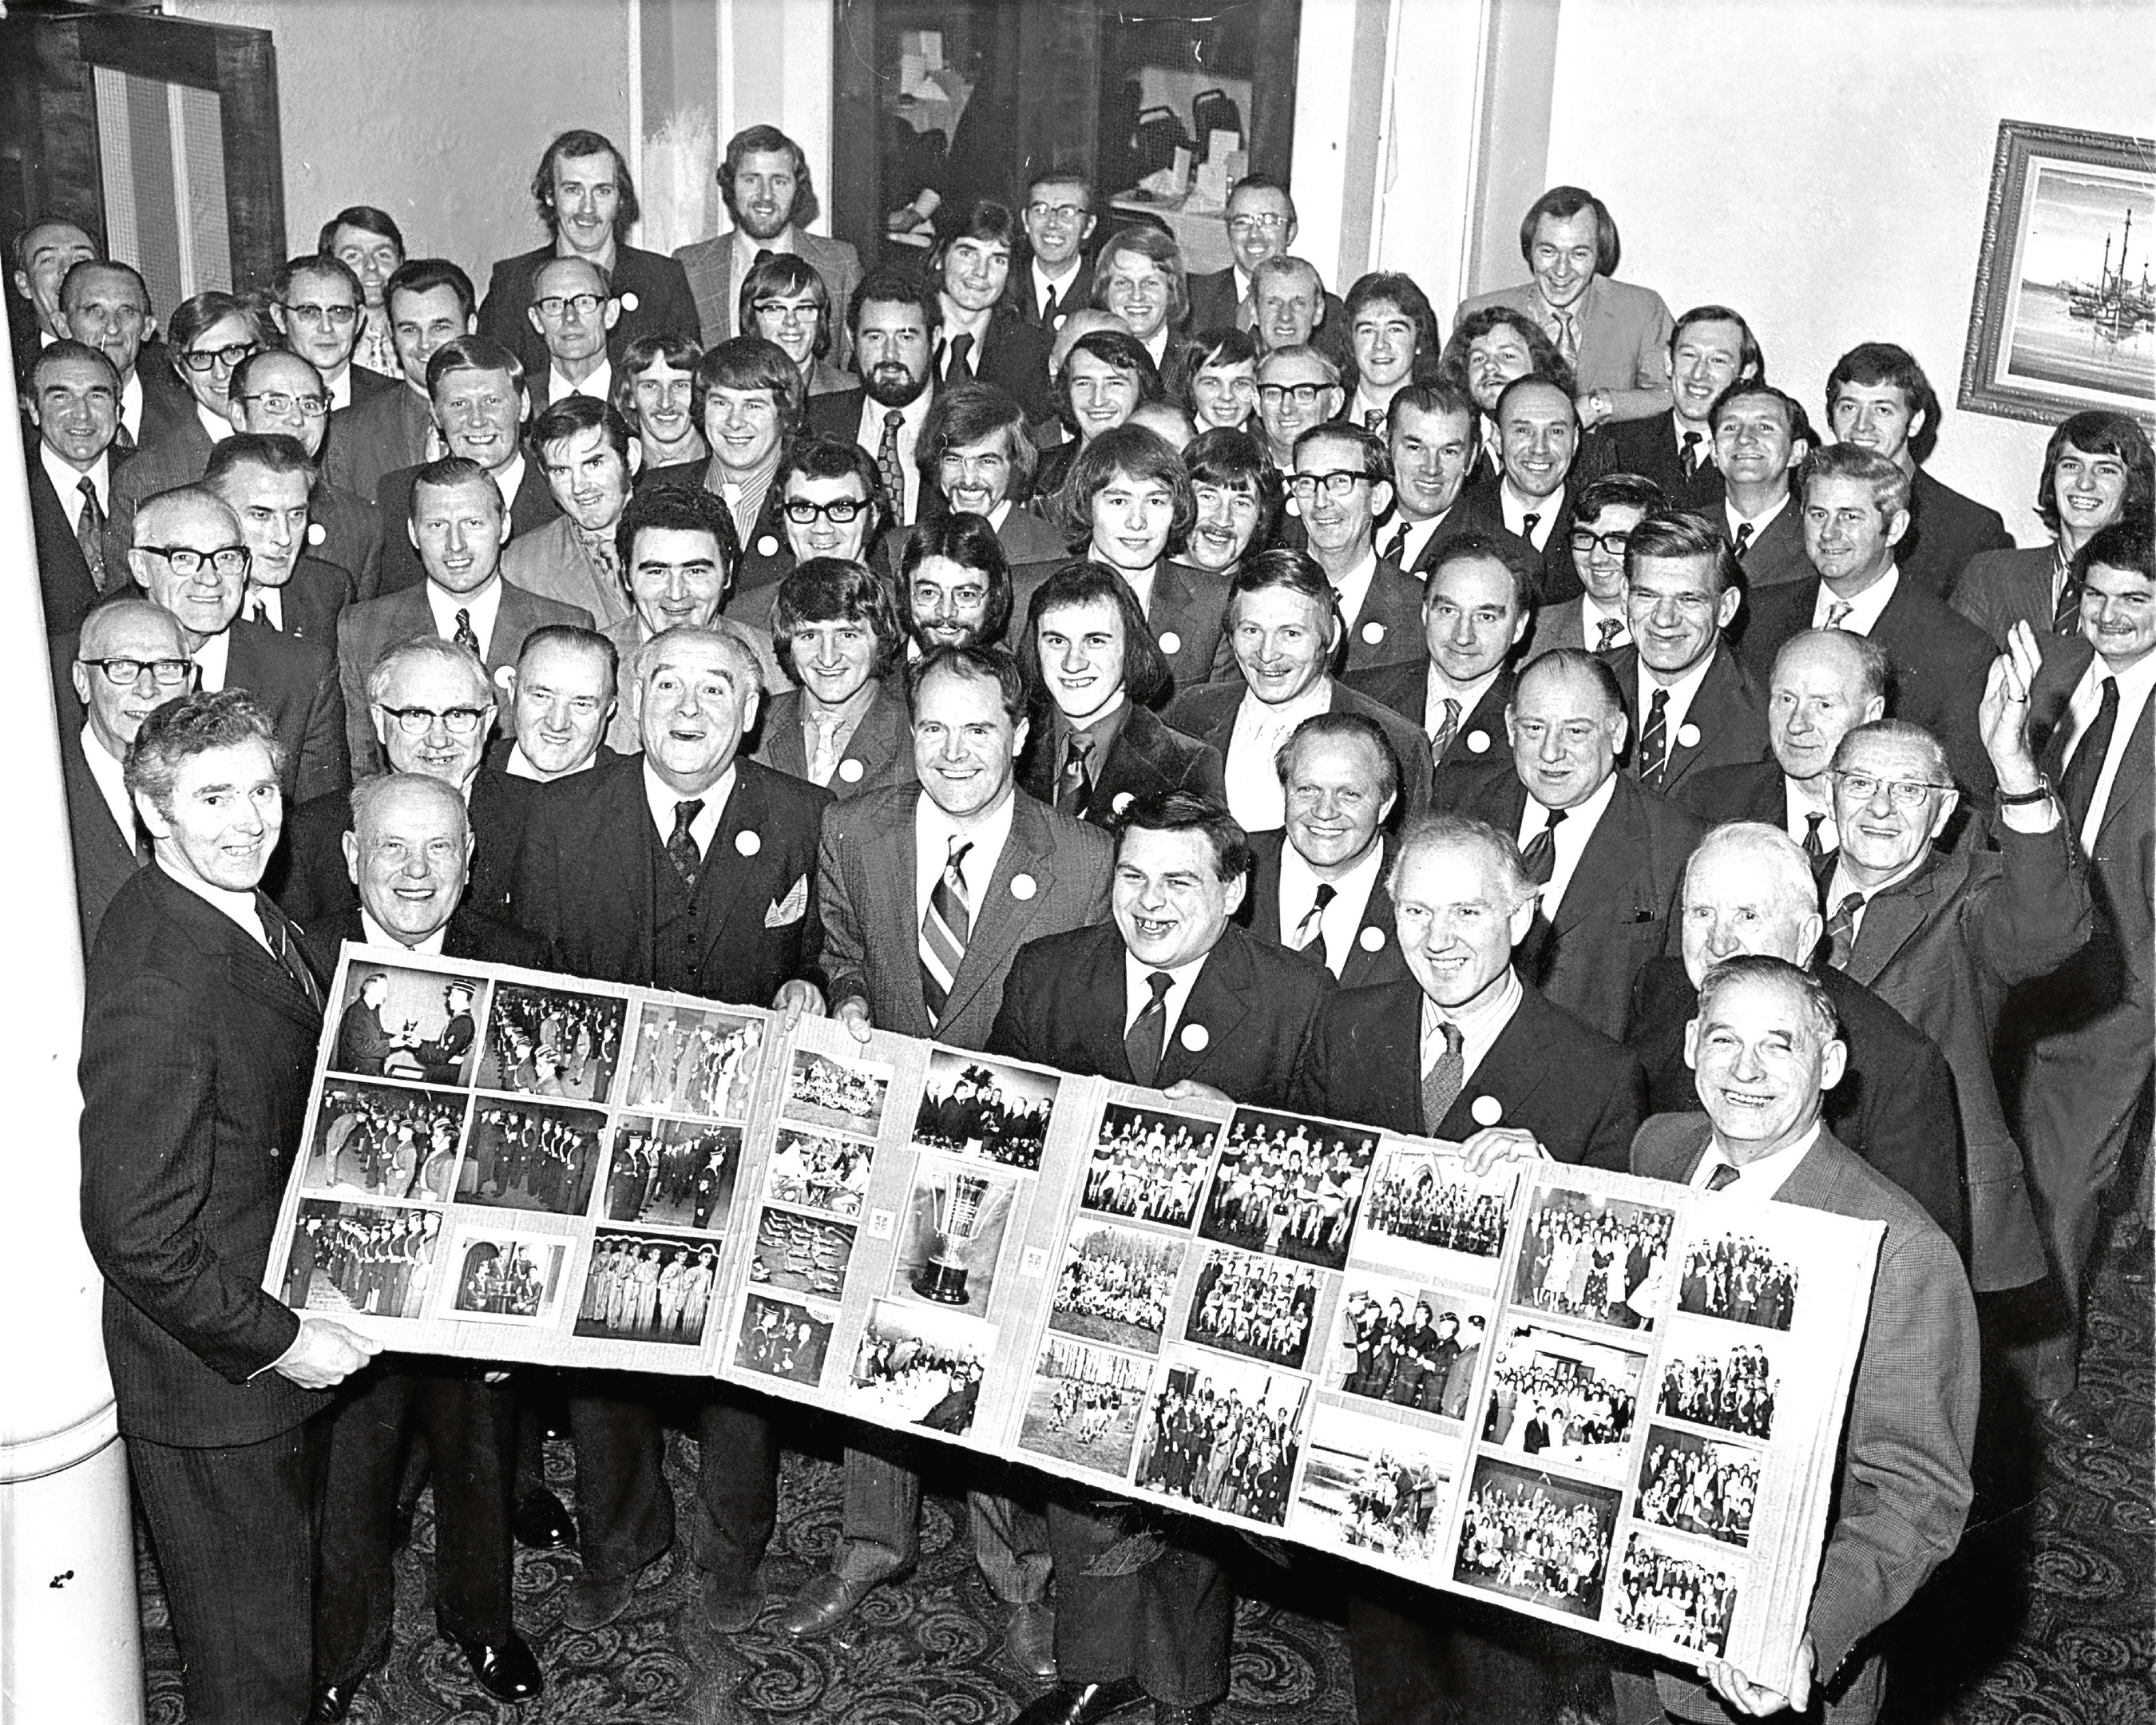 Veterans of the 12th Aberdeen (Ferryhill North Church) Company celebrating its 75th birthday.